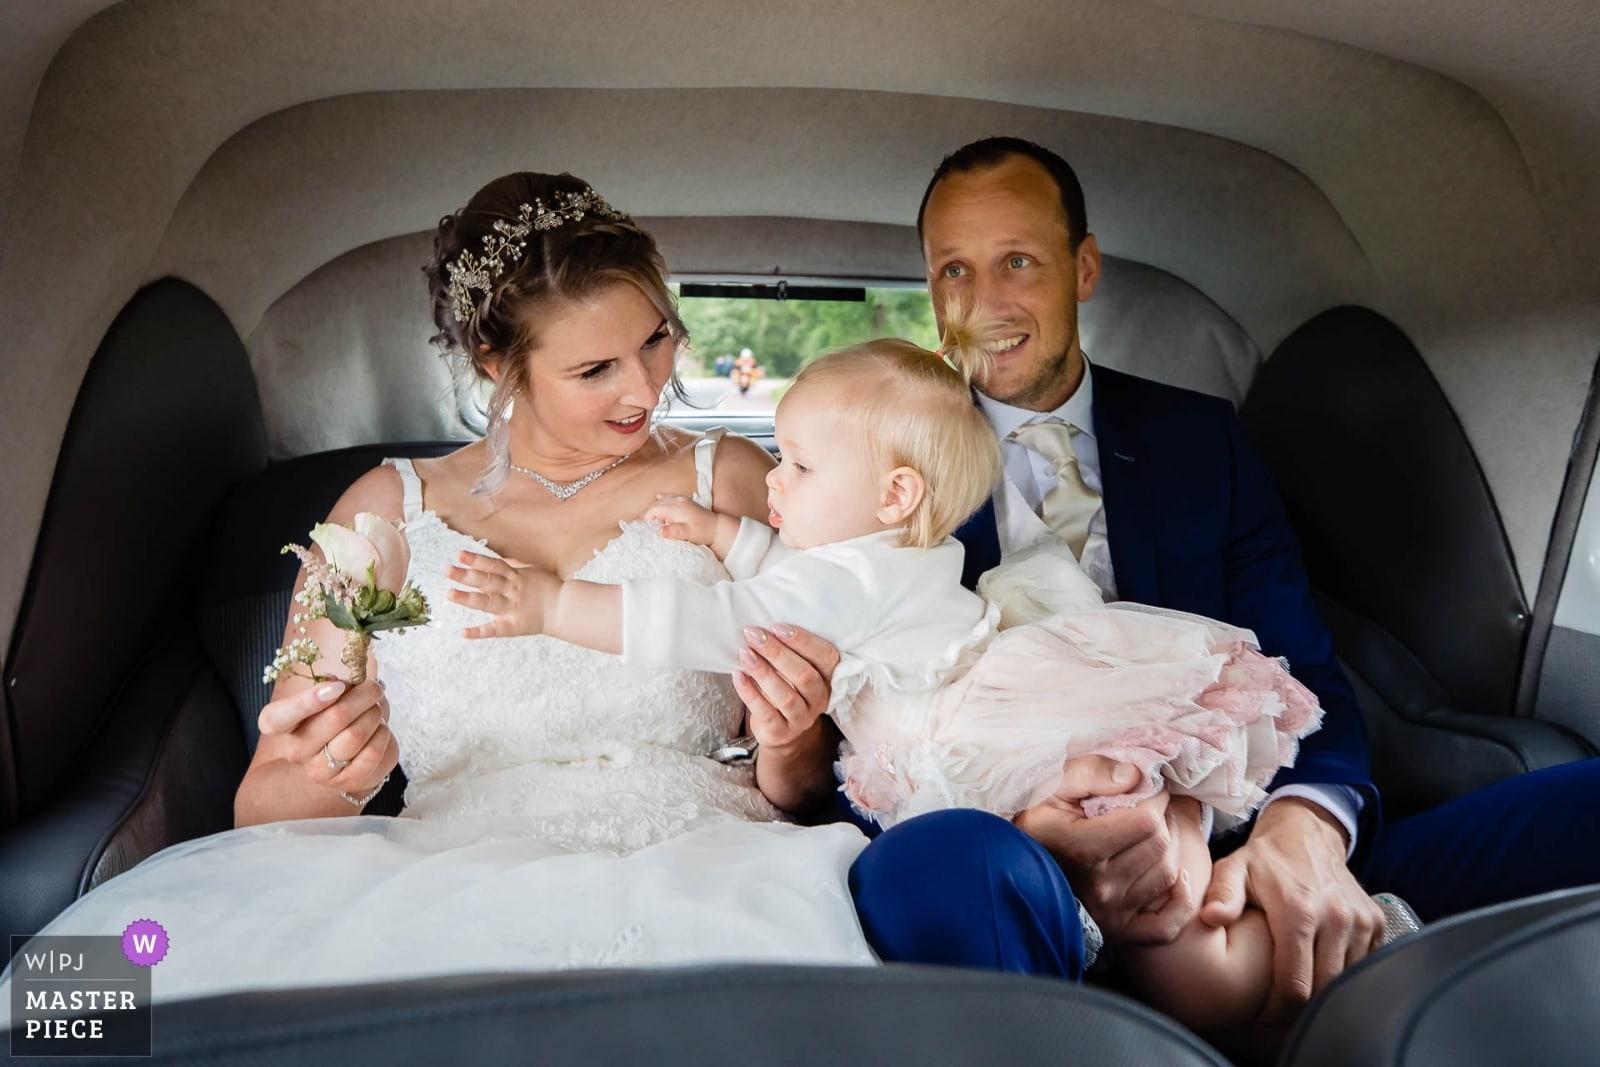 2019v11 wedding-photographer-2545795